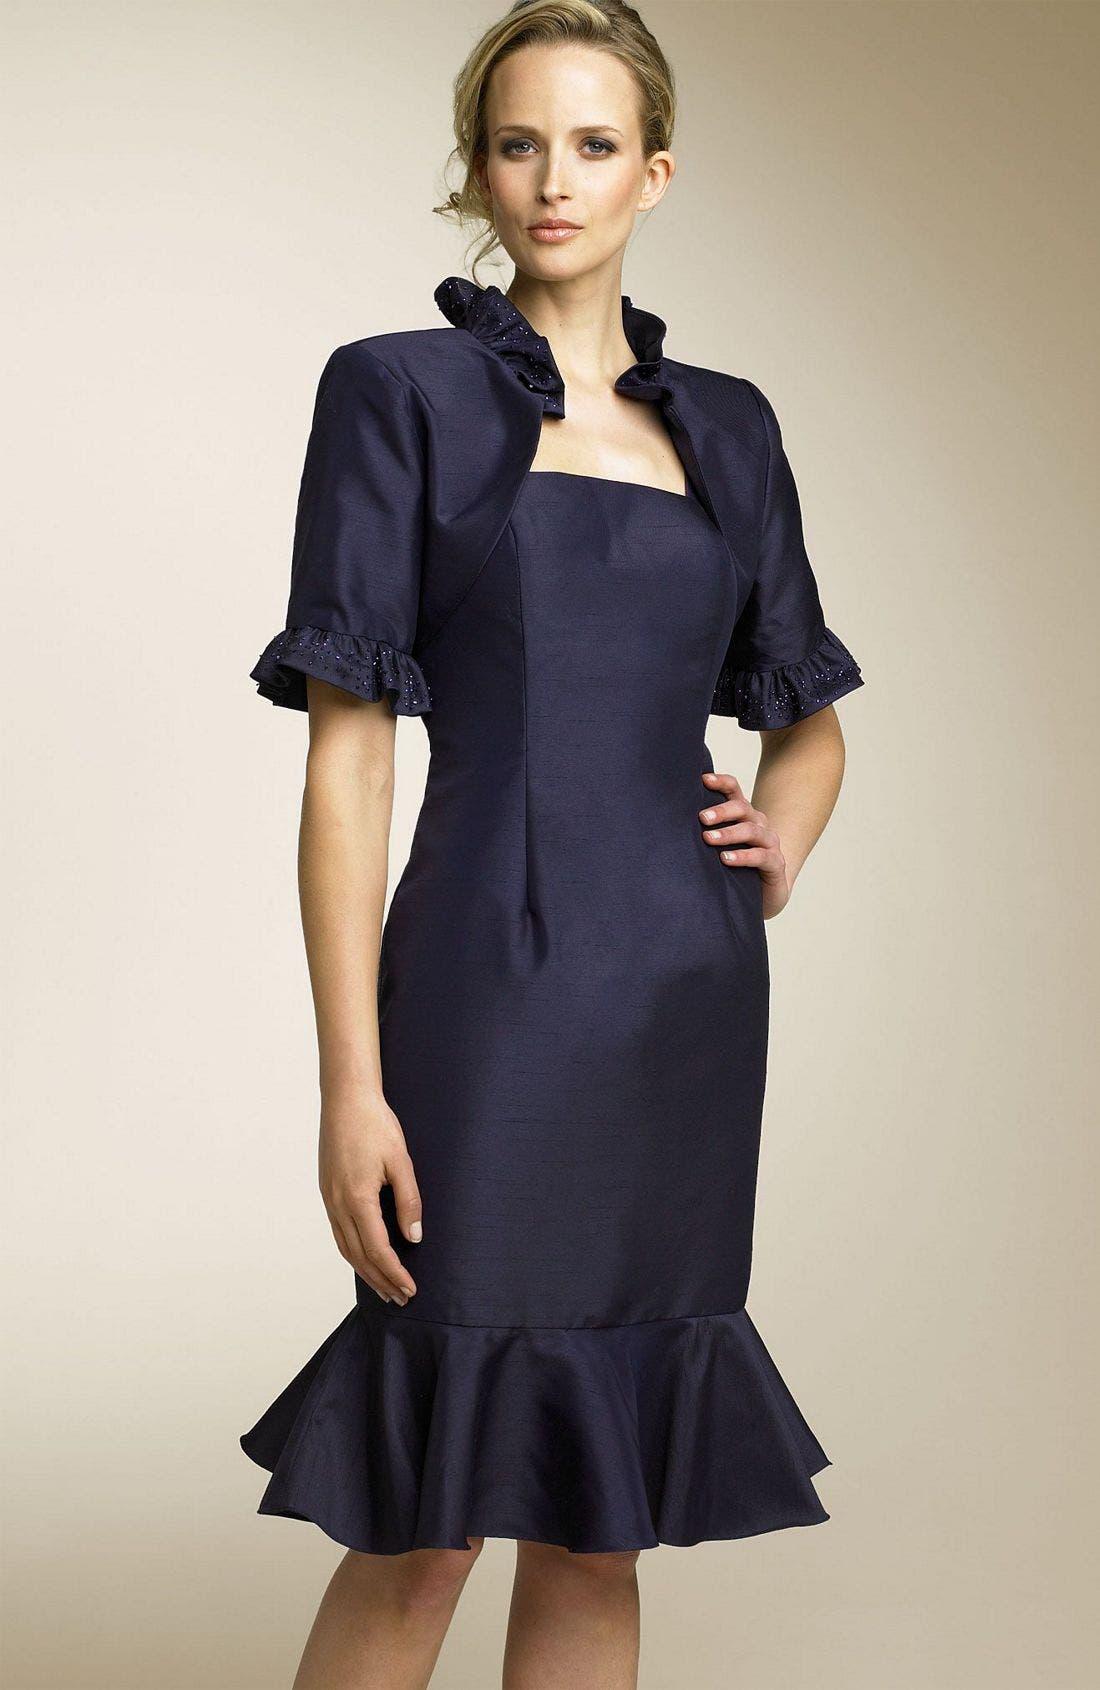 Main Image - Sean Collection Ruffle Dress & Jacket